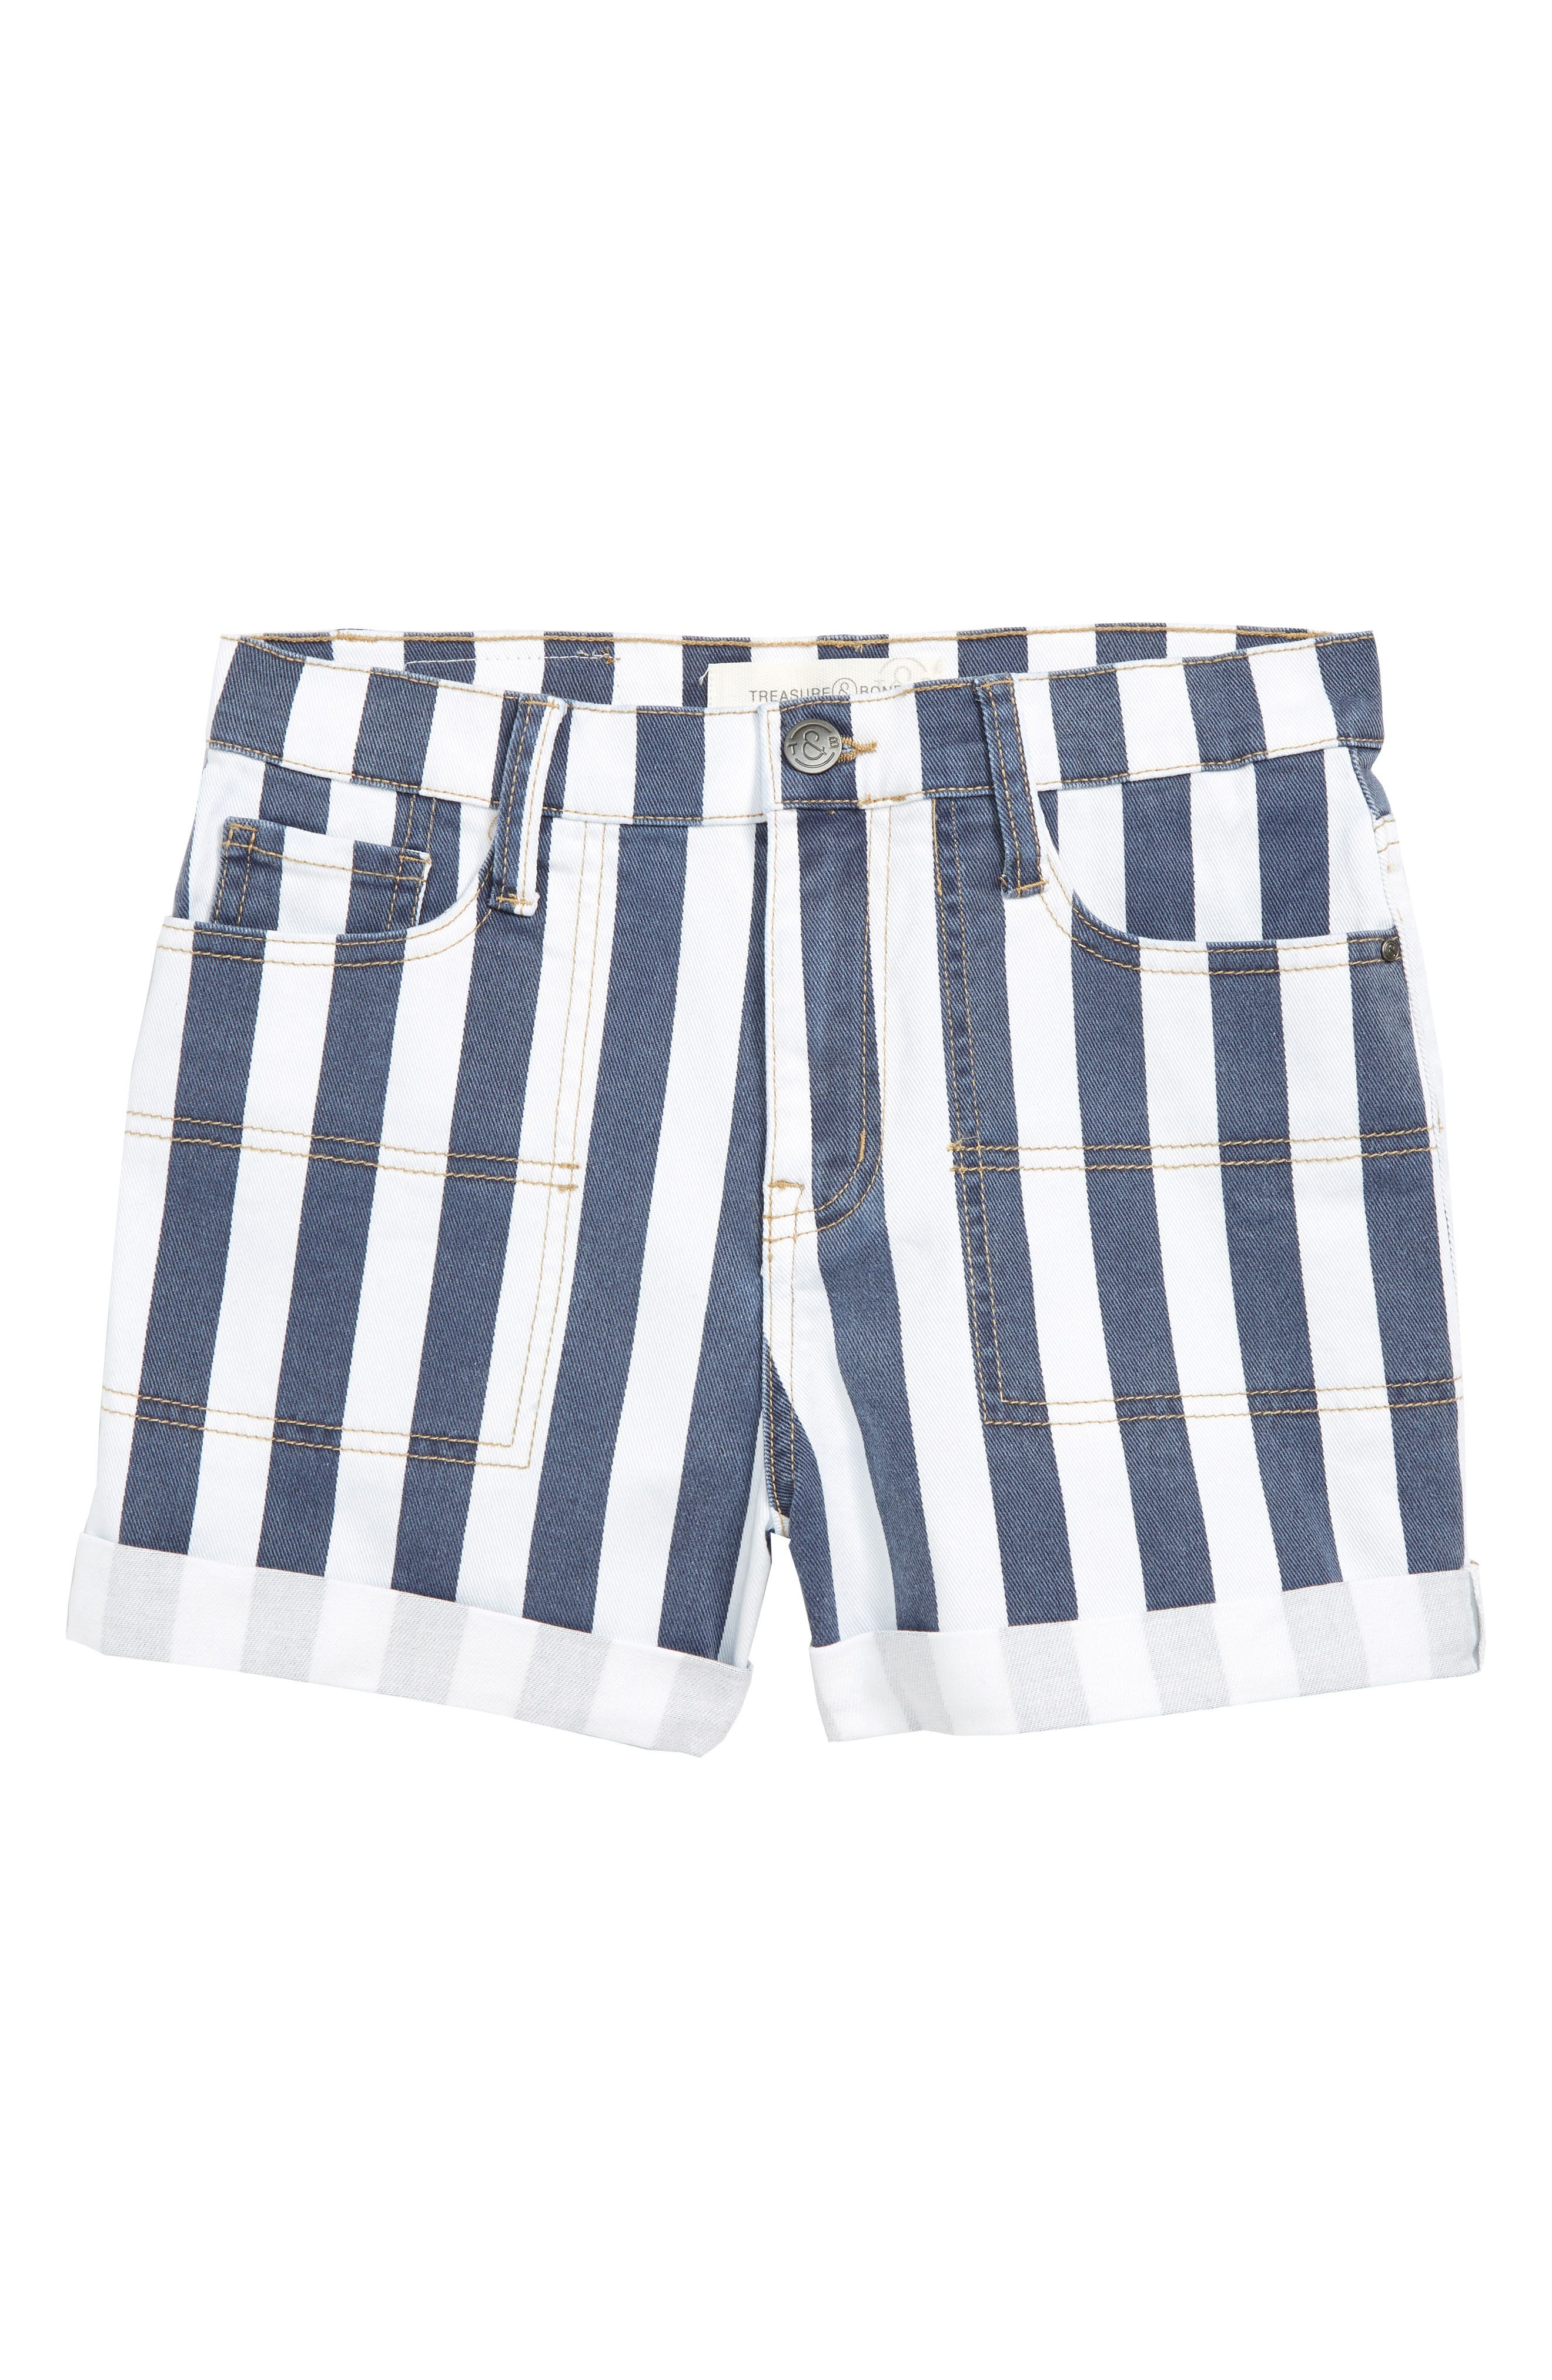 TREASURE & BOND, Stripe High Waist Vintage Denim Shorts, Main thumbnail 1, color, BAND WASH